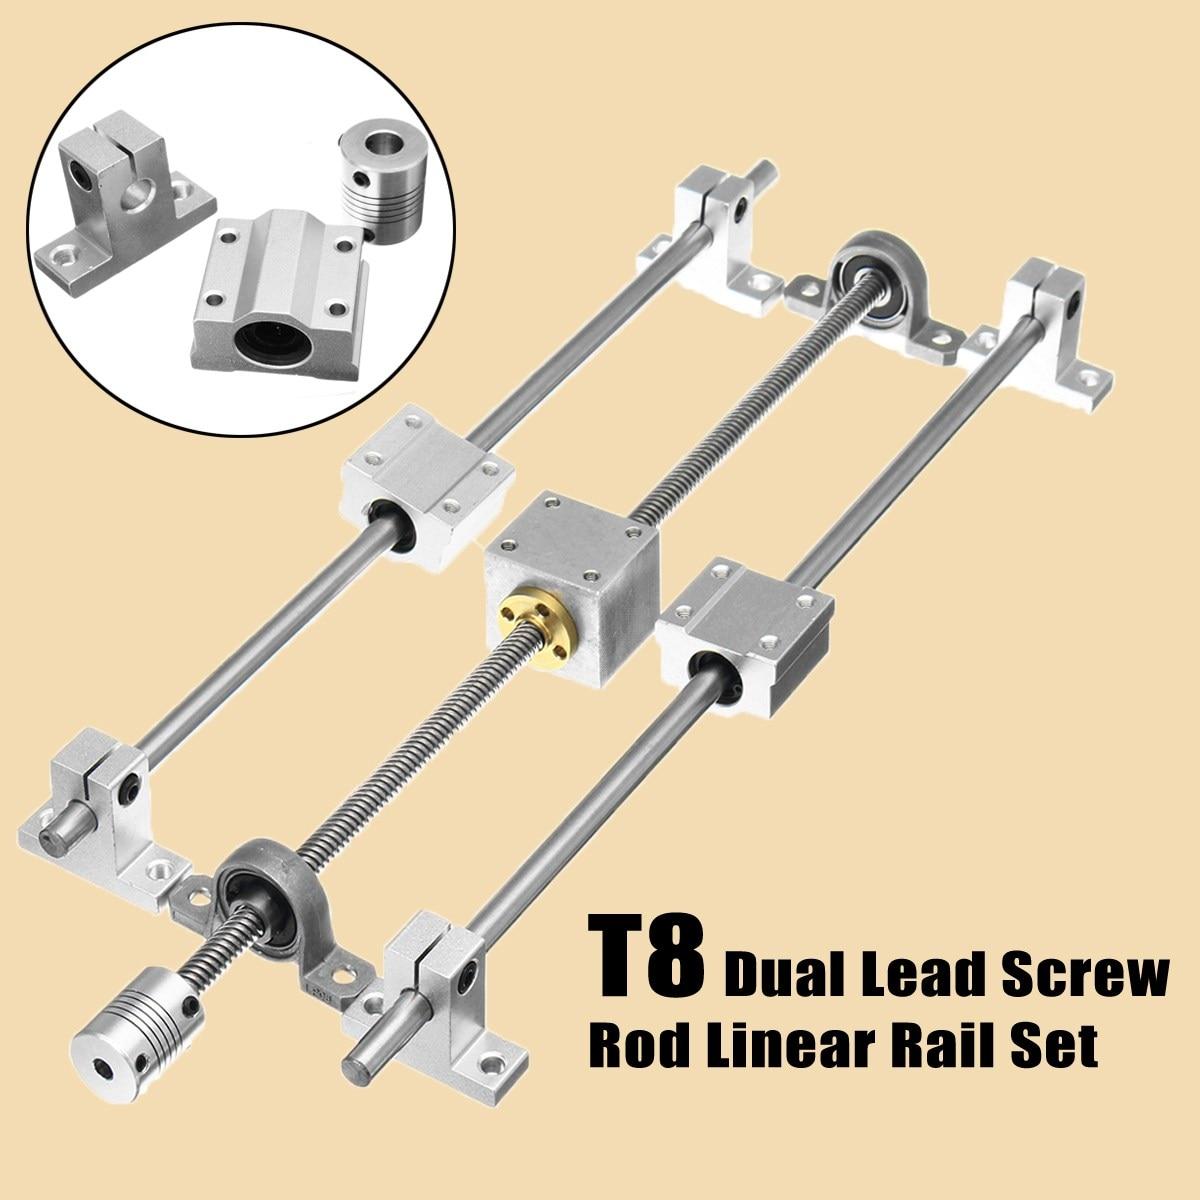 Horizontal Shaft 350mm T8 Dual Rail Lead Screw Rod Linear Coupling Support Guide & Lead Screw RodSetHorizontal Shaft 350mm T8 Dual Rail Lead Screw Rod Linear Coupling Support Guide & Lead Screw RodSet